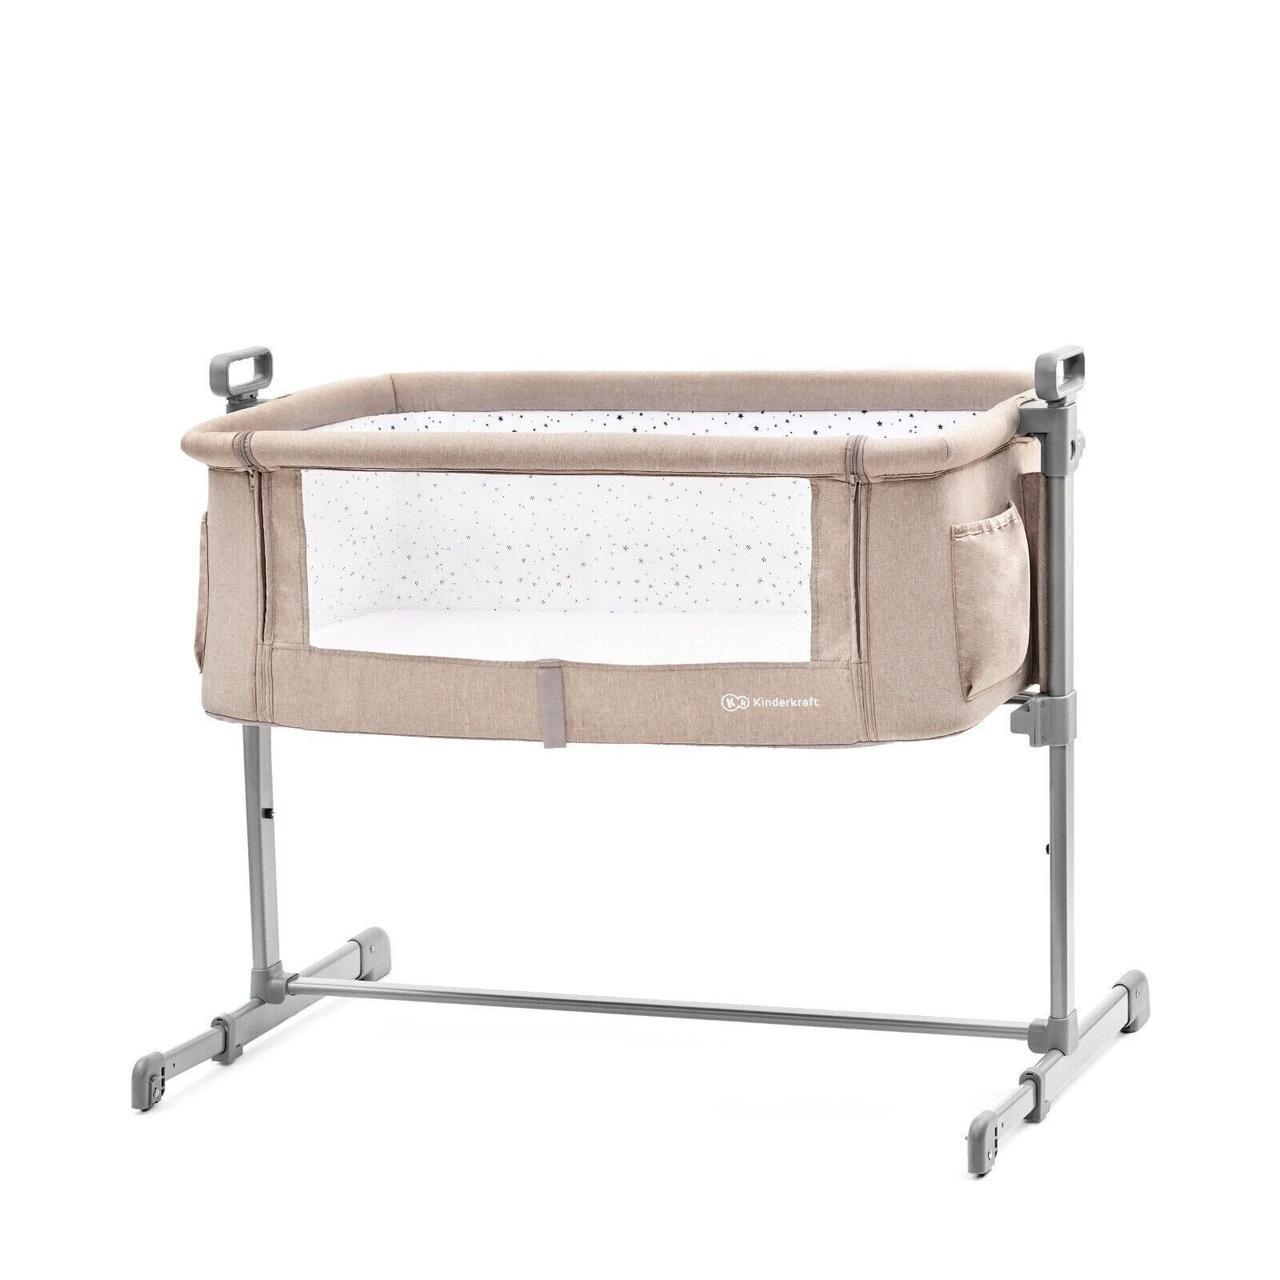 Доставне ліжко-люлька Kinderkraft Neste Beige (KKLNESTBEG0000)